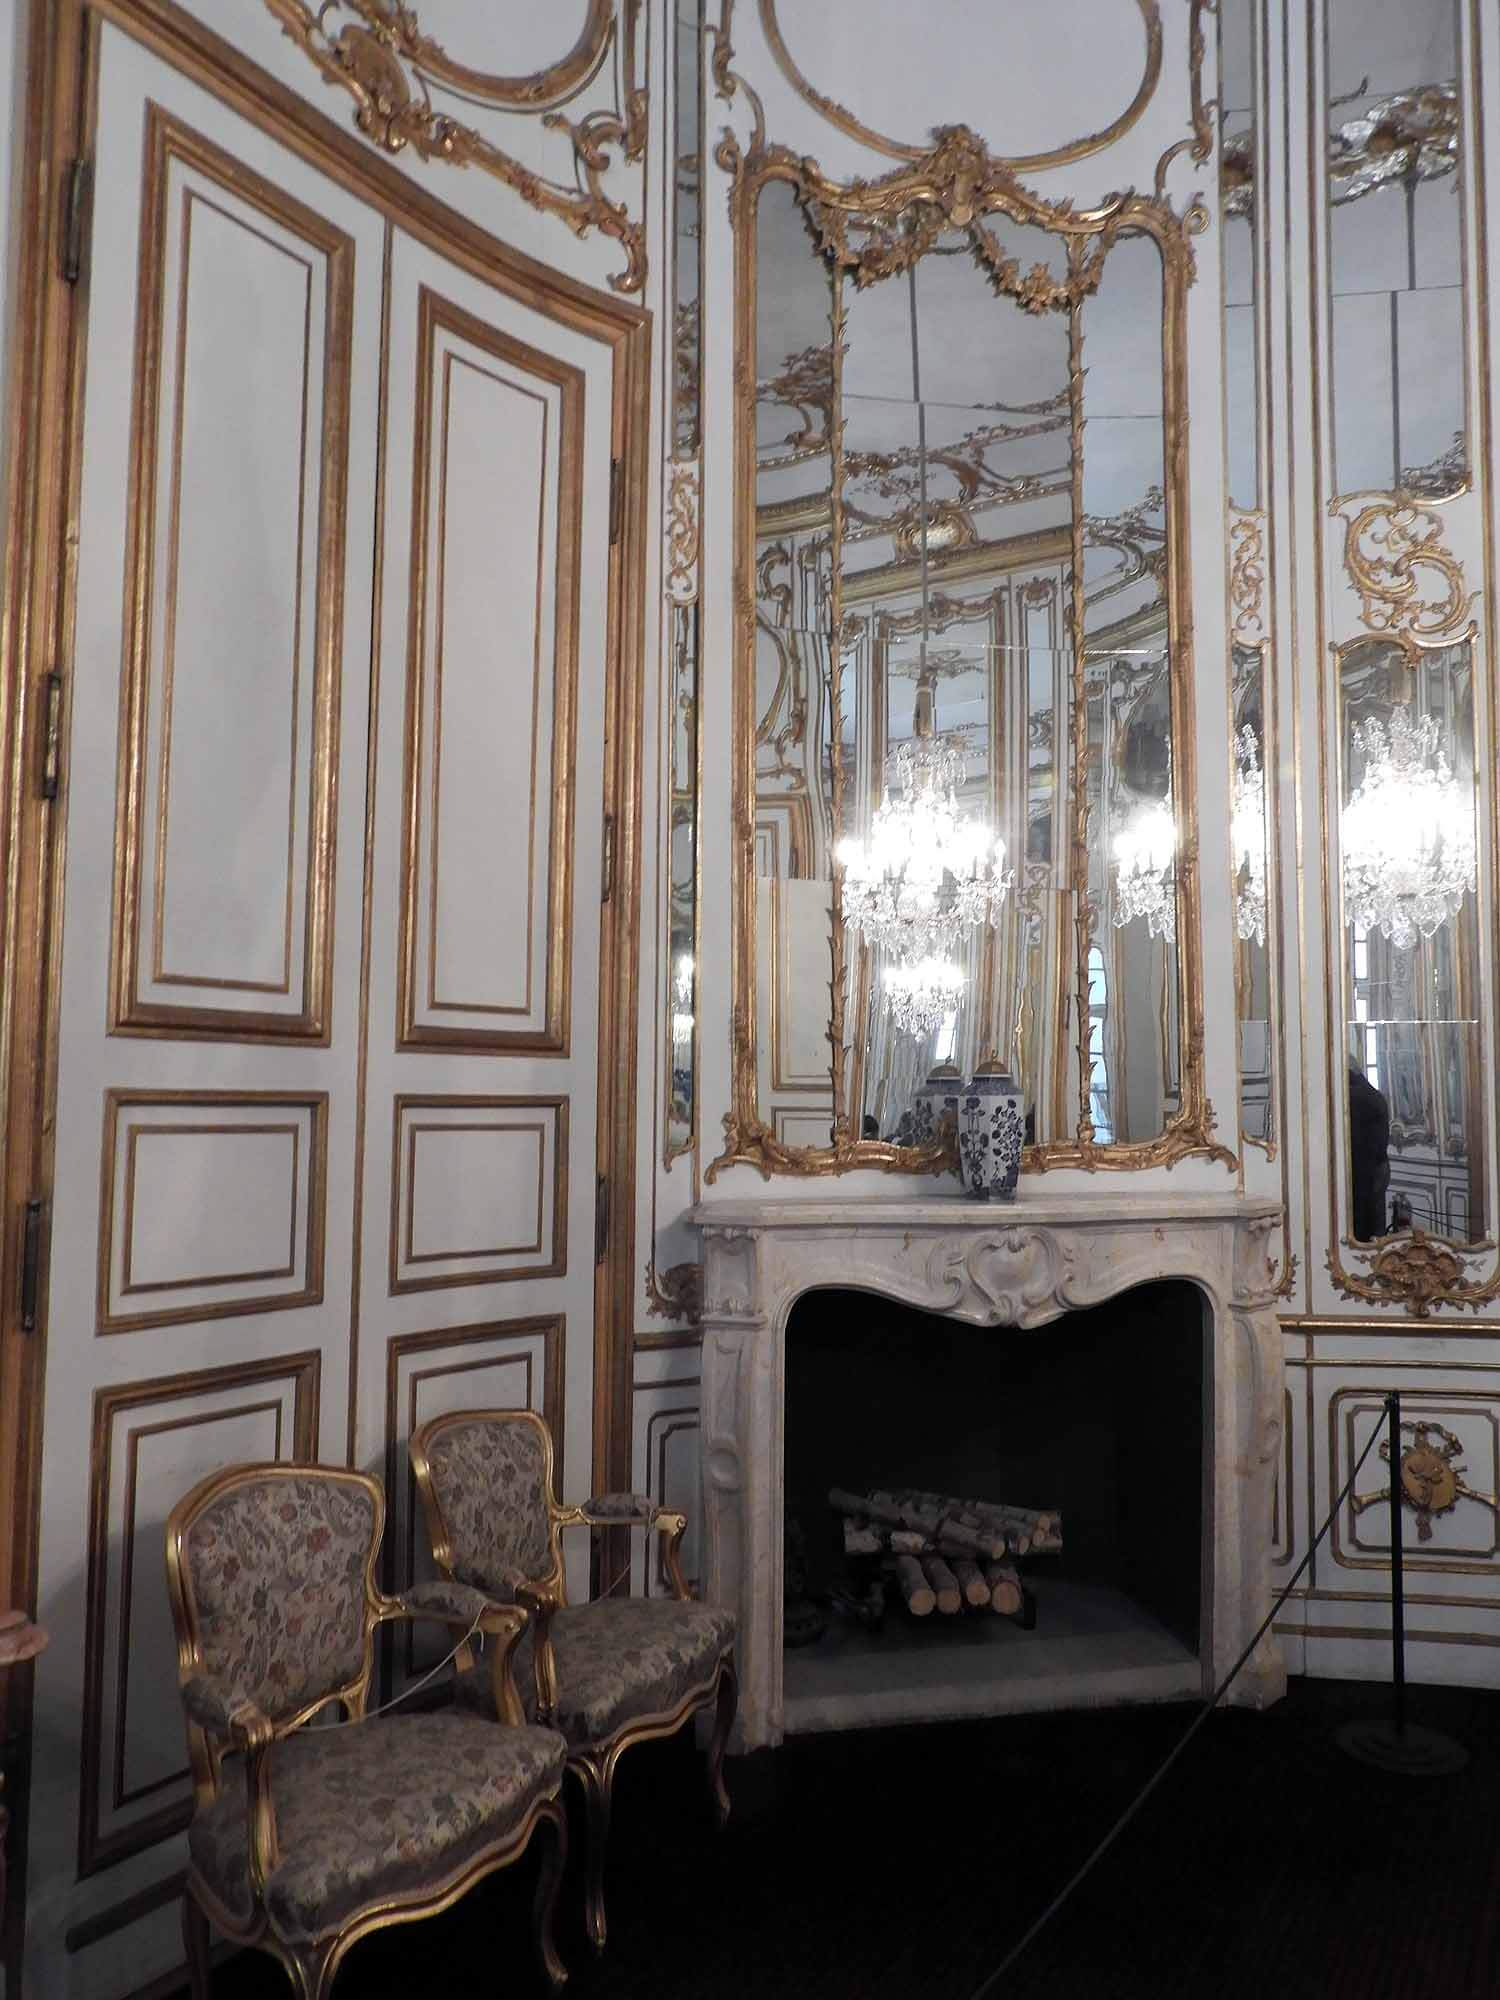 germany-stuttgart-schloss-solitude-fireplace.jpg